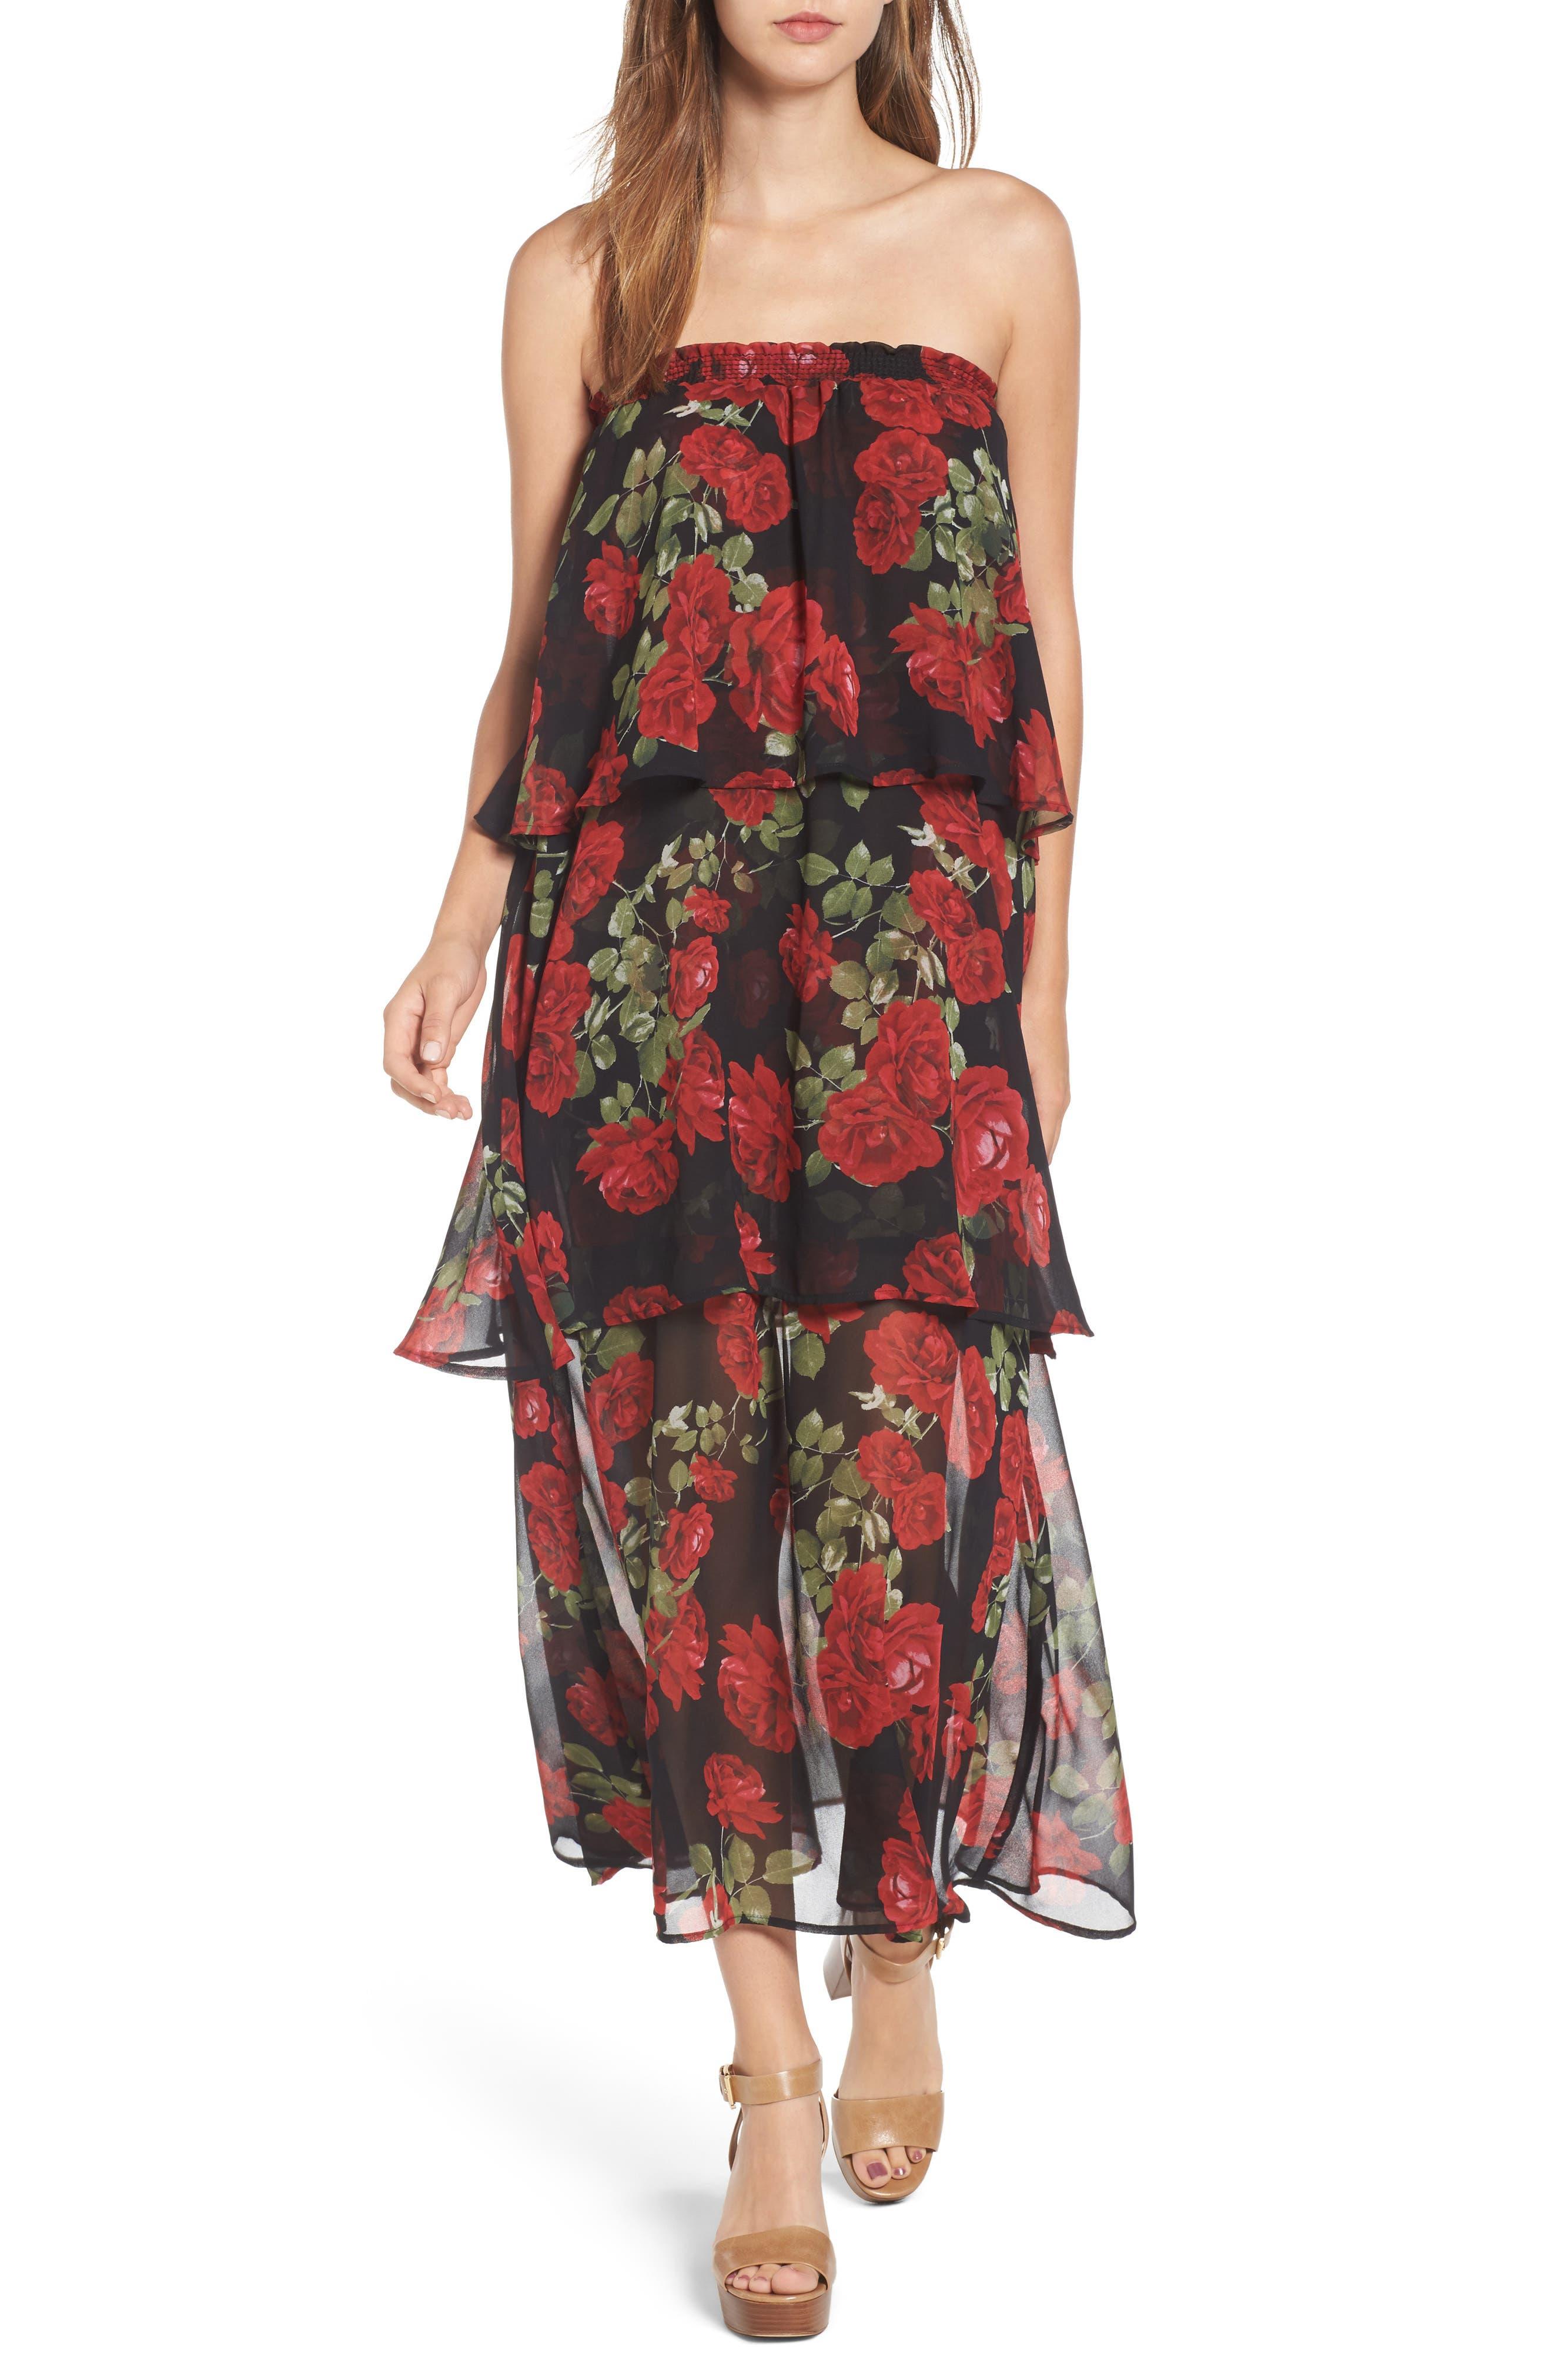 Main Image - Show Me Your Mumu Karla Convertible Strapless Dress